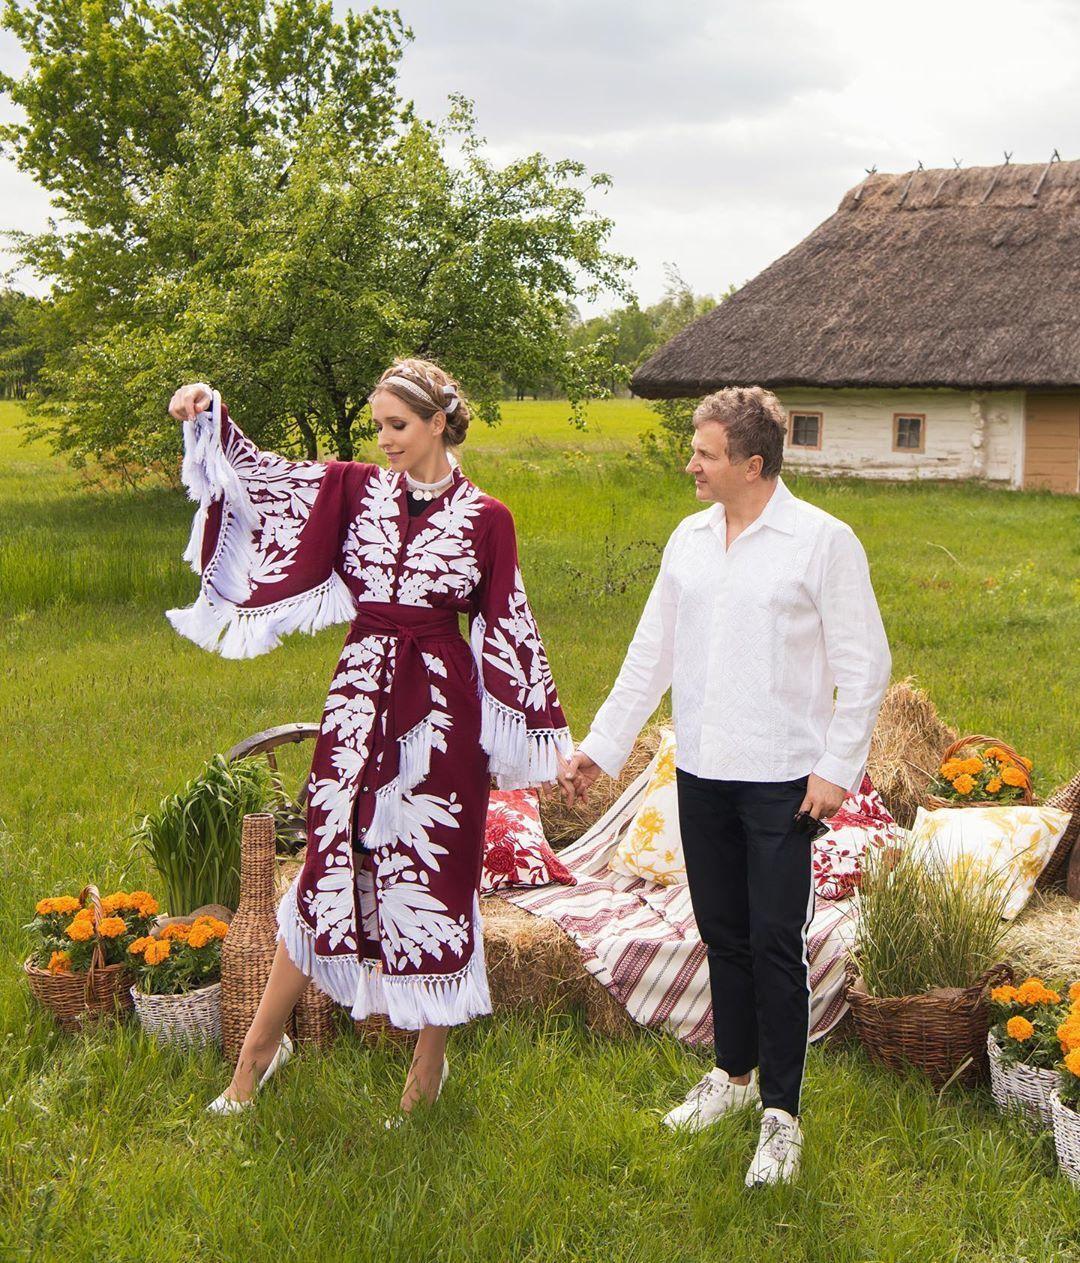 Катерина Осадча та Юрій Горбунов_3